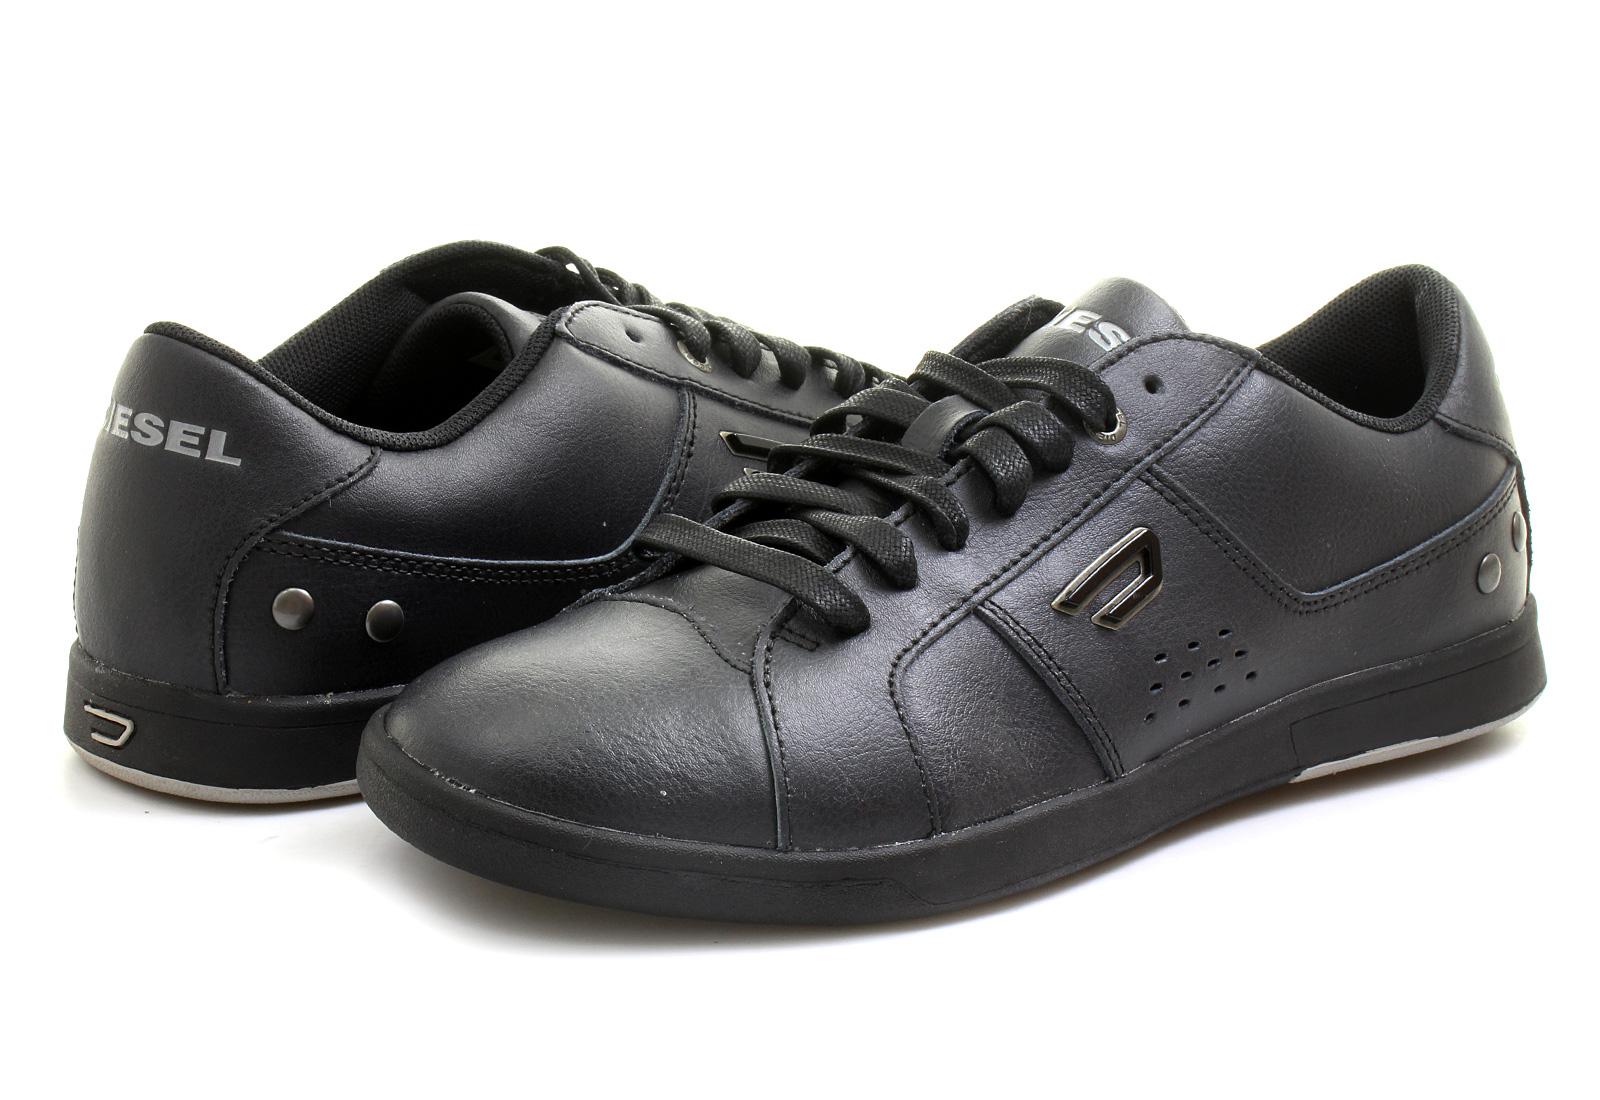 Diesel Shoes - Gotcha - 985-371-8013 - Online shop for ...